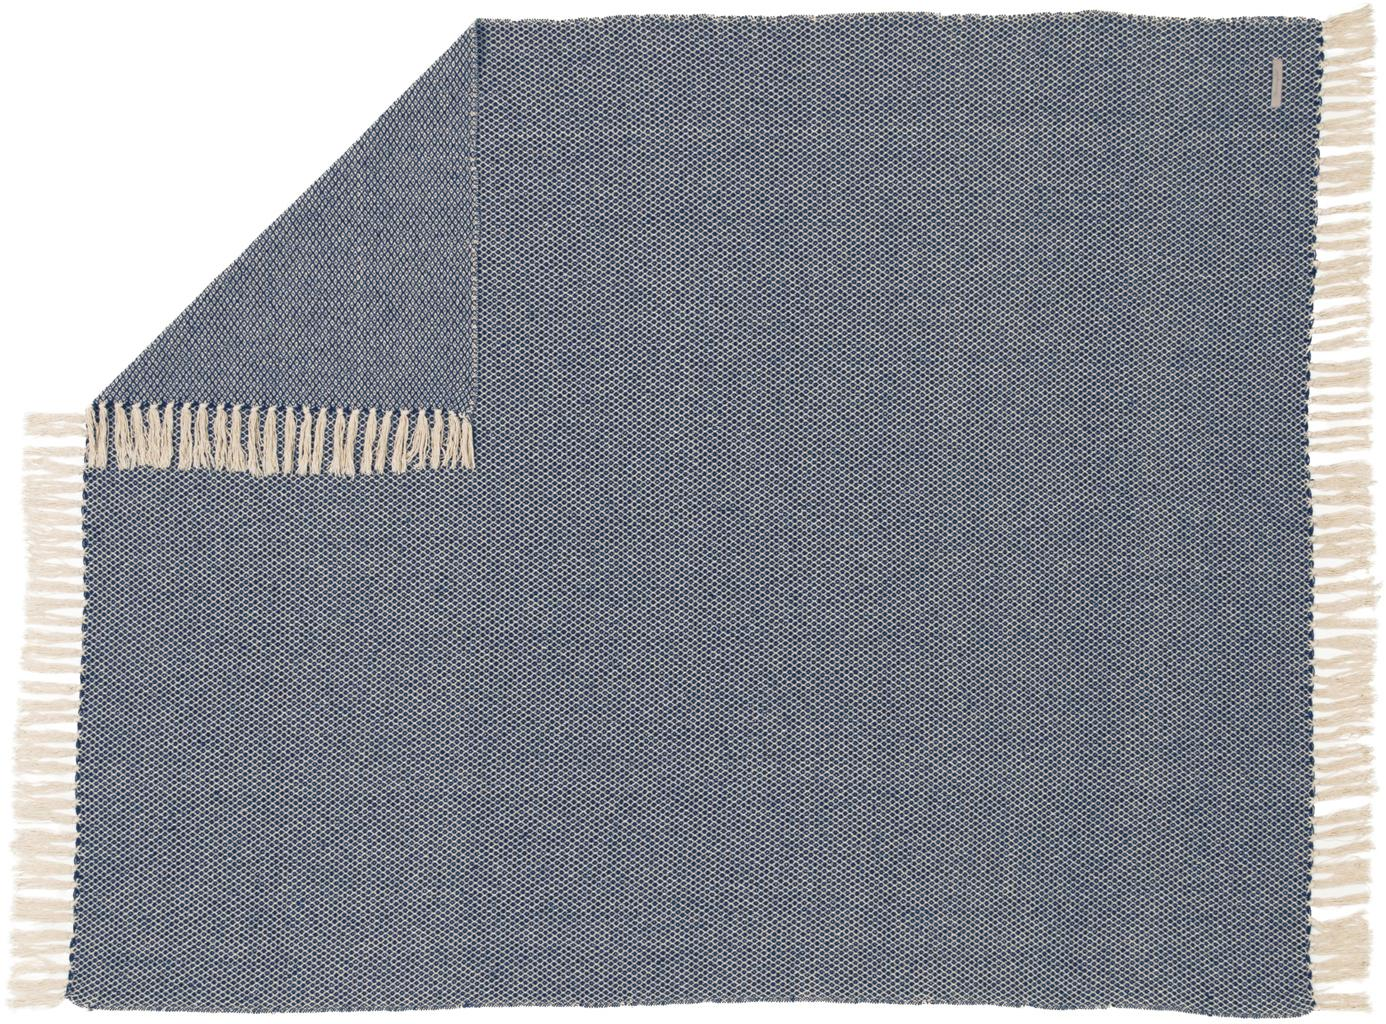 Fein gemustertes Plaid Thea, 58%Baumwolle,22%Polyester, 12%Acryl,4%Rayon,4%Nylon, Dunkles Marineblau, Hellbeige, 130 x 160 cm